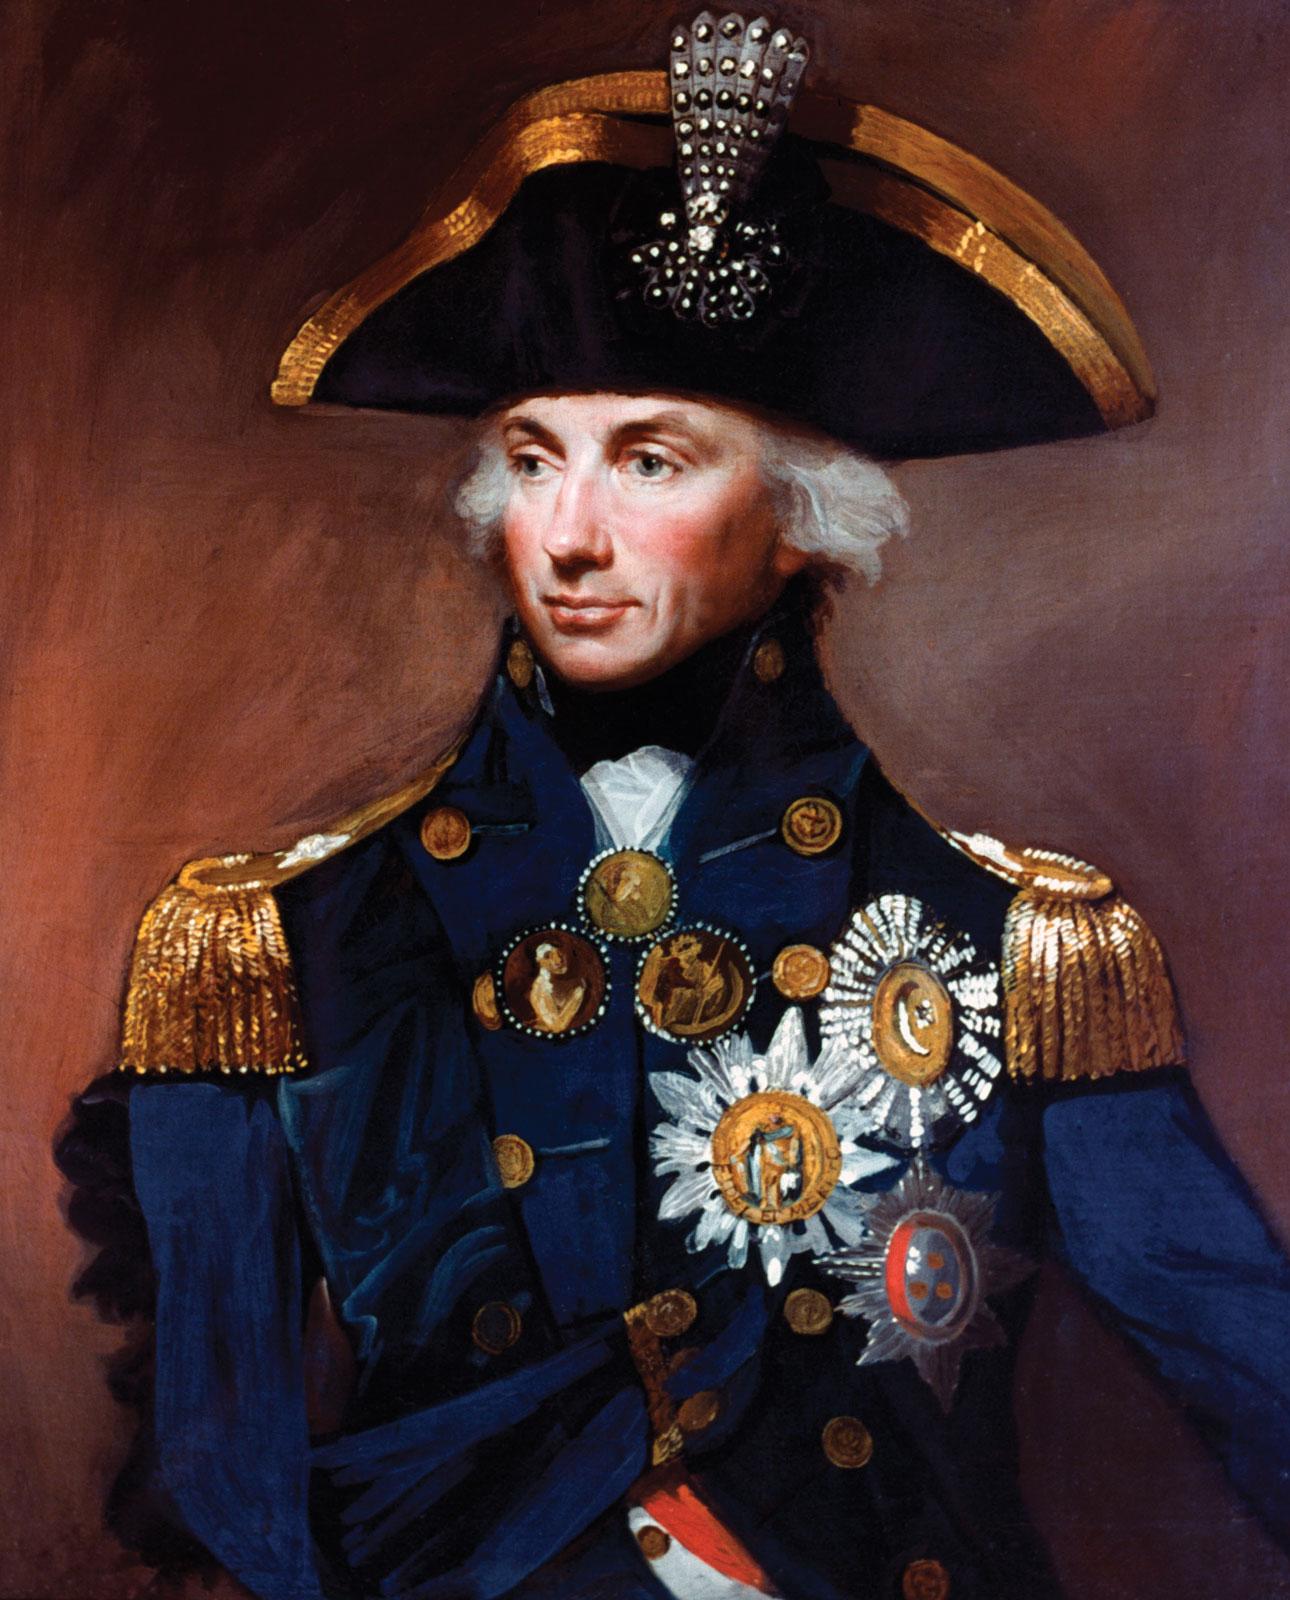 Rear-Admiral_Sir_Horatio_Nelson,_1758%E2